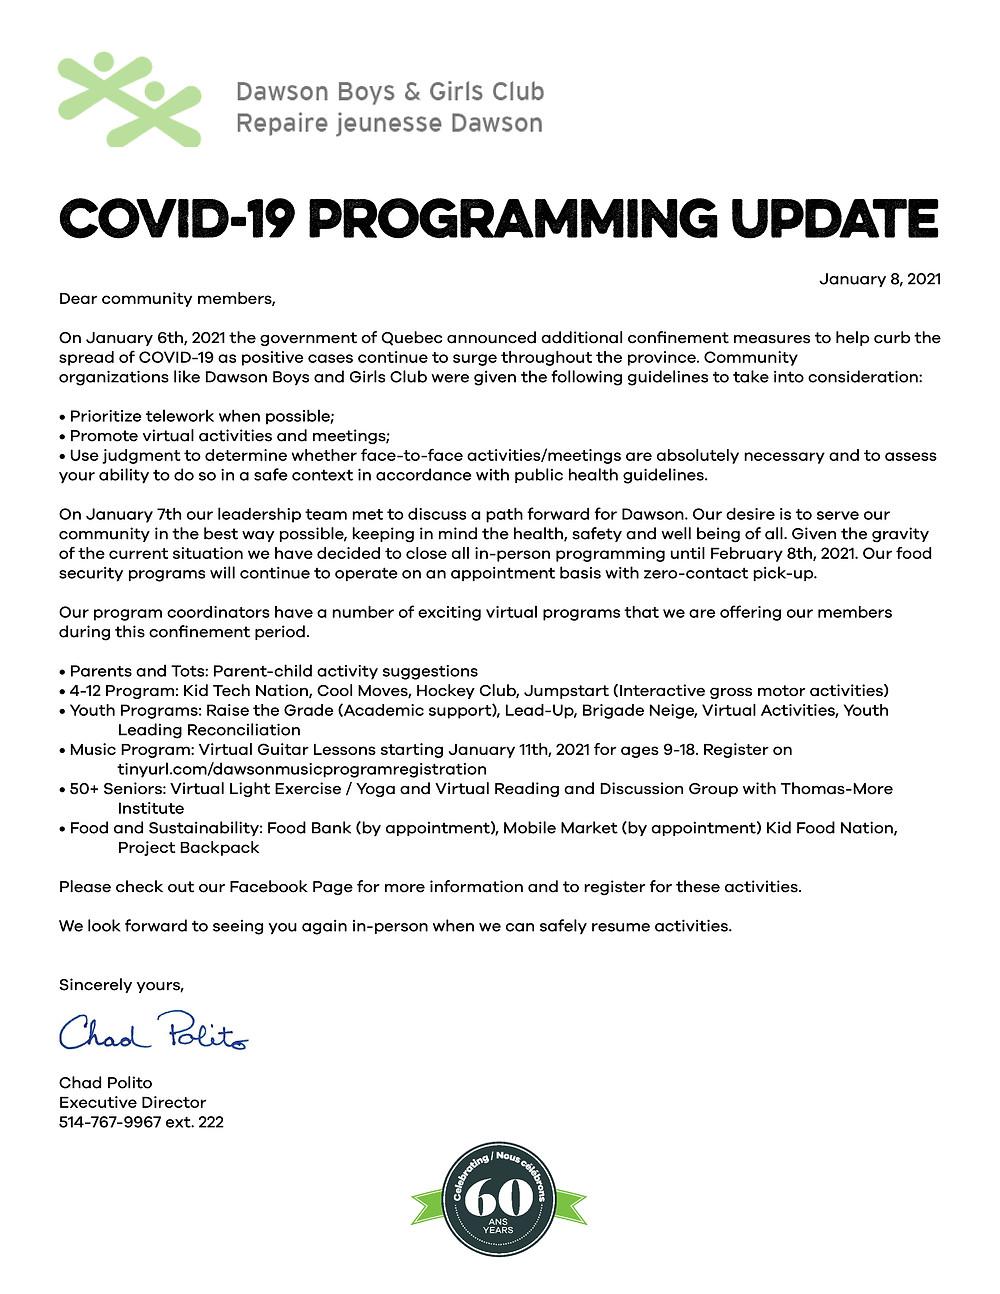 COVID-19 Programming Update